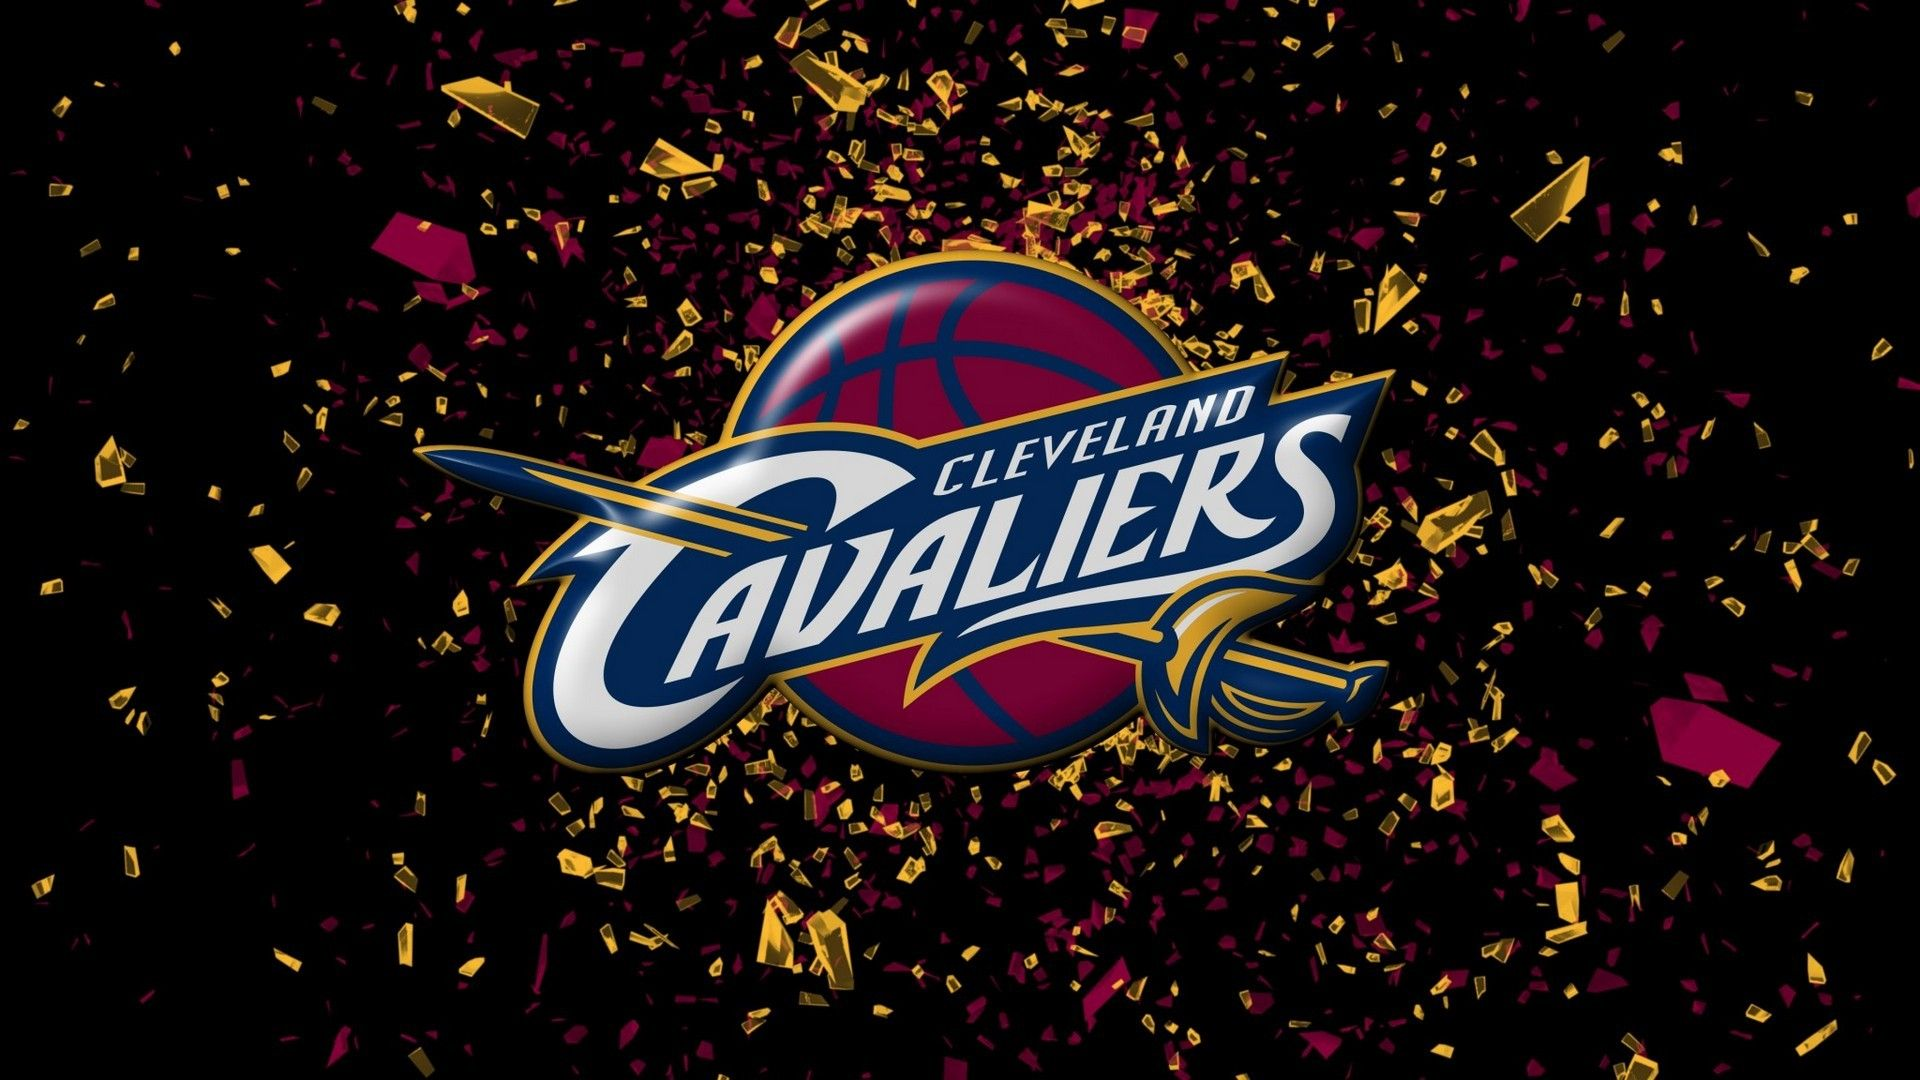 Hd Desktop Wallpaper Cleveland Cavaliers 2020 Basketball Wallpaper Cavaliers Wallpaper Basketball Wallpaper Cavs Wallpaper